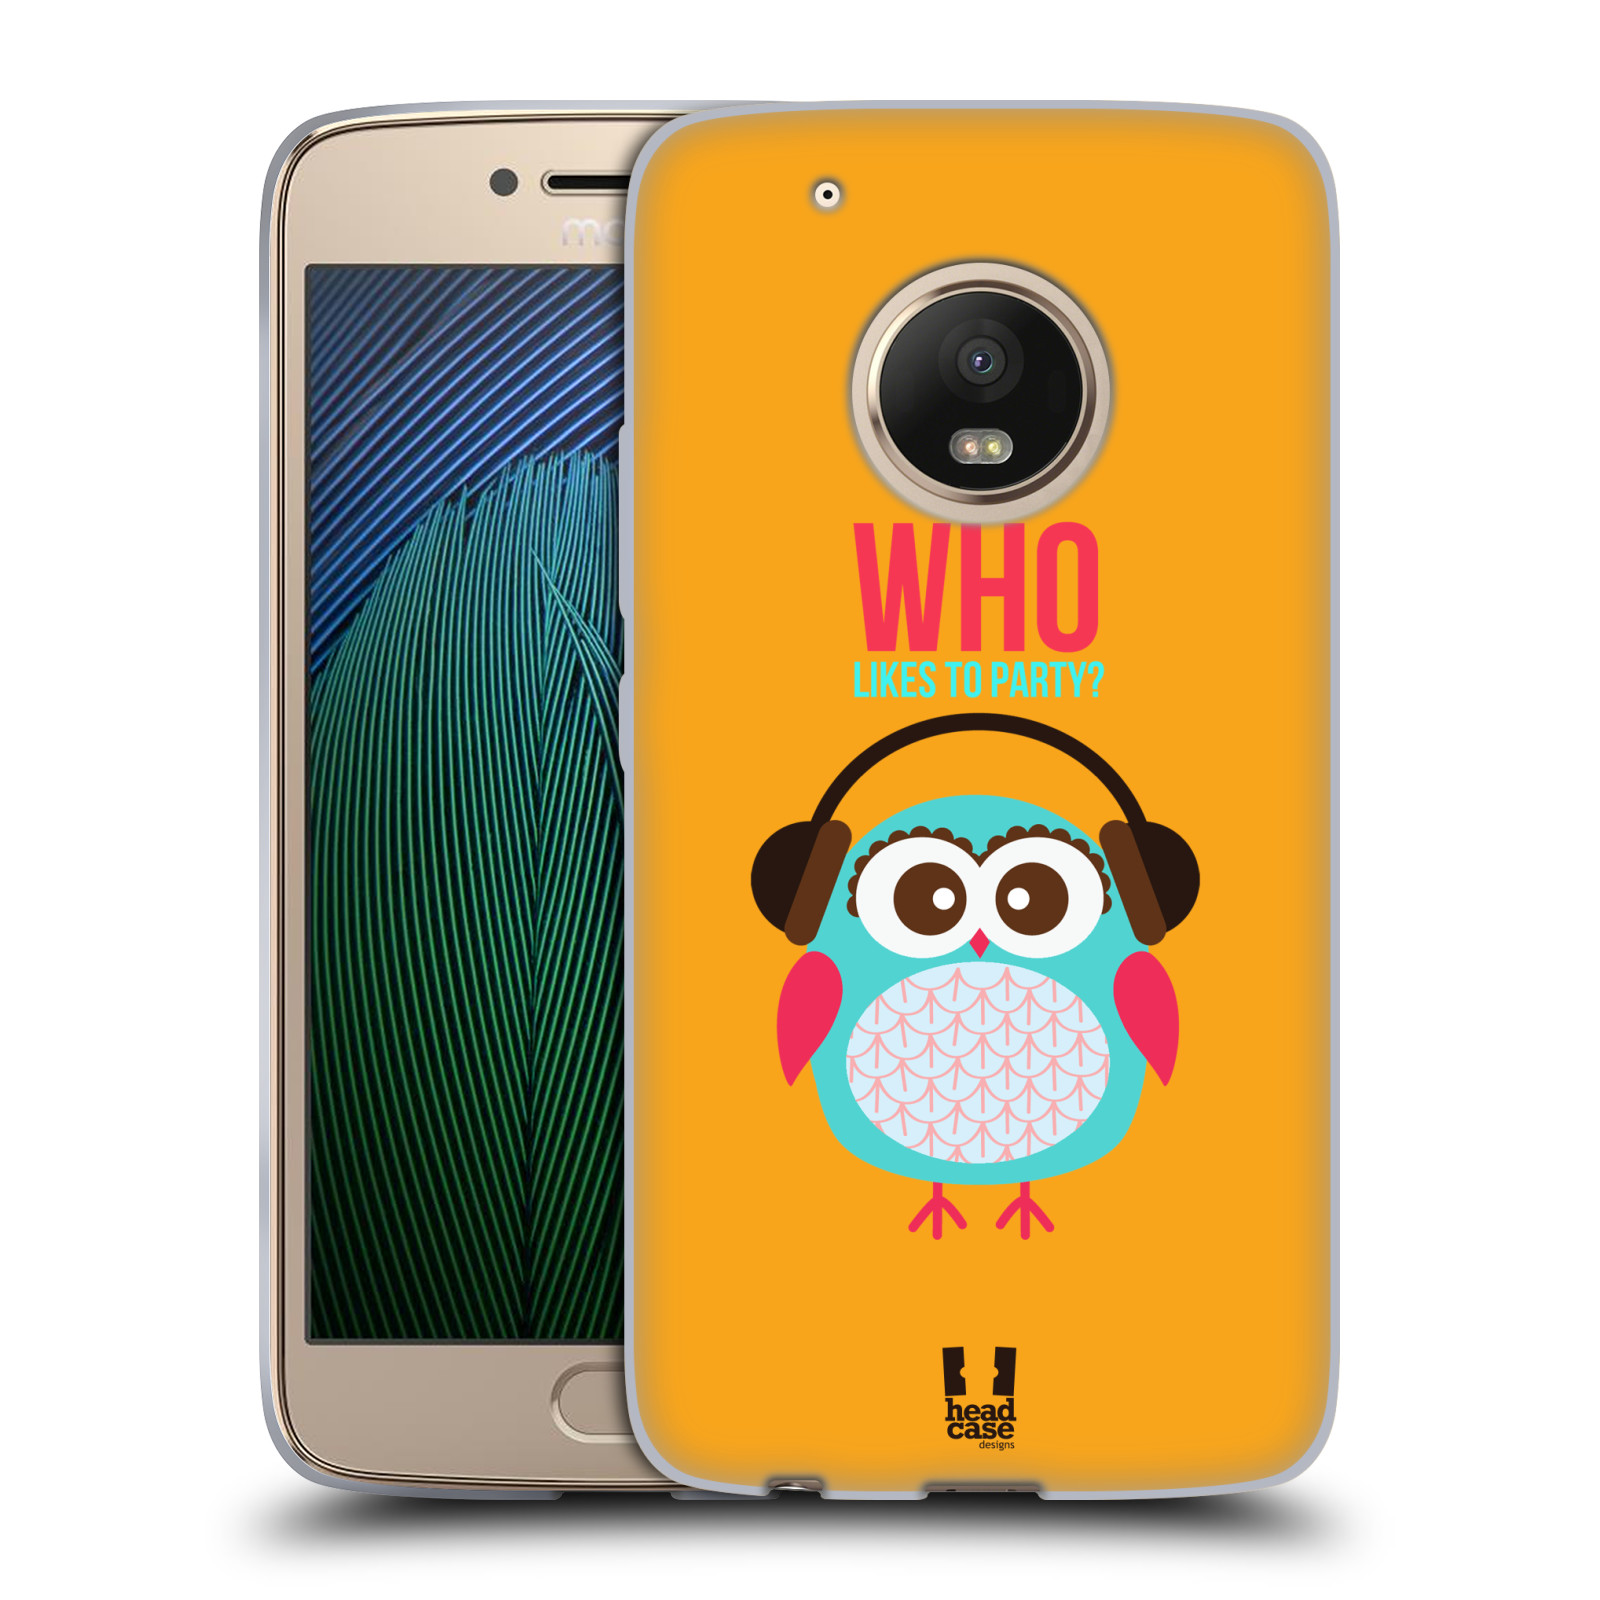 HEAD-CASE-DESIGNS-LITTLE-OWLS-KAWAII-SOFT-GEL-CASE-FOR-MOTOROLA-MOTO-G5-PLUS